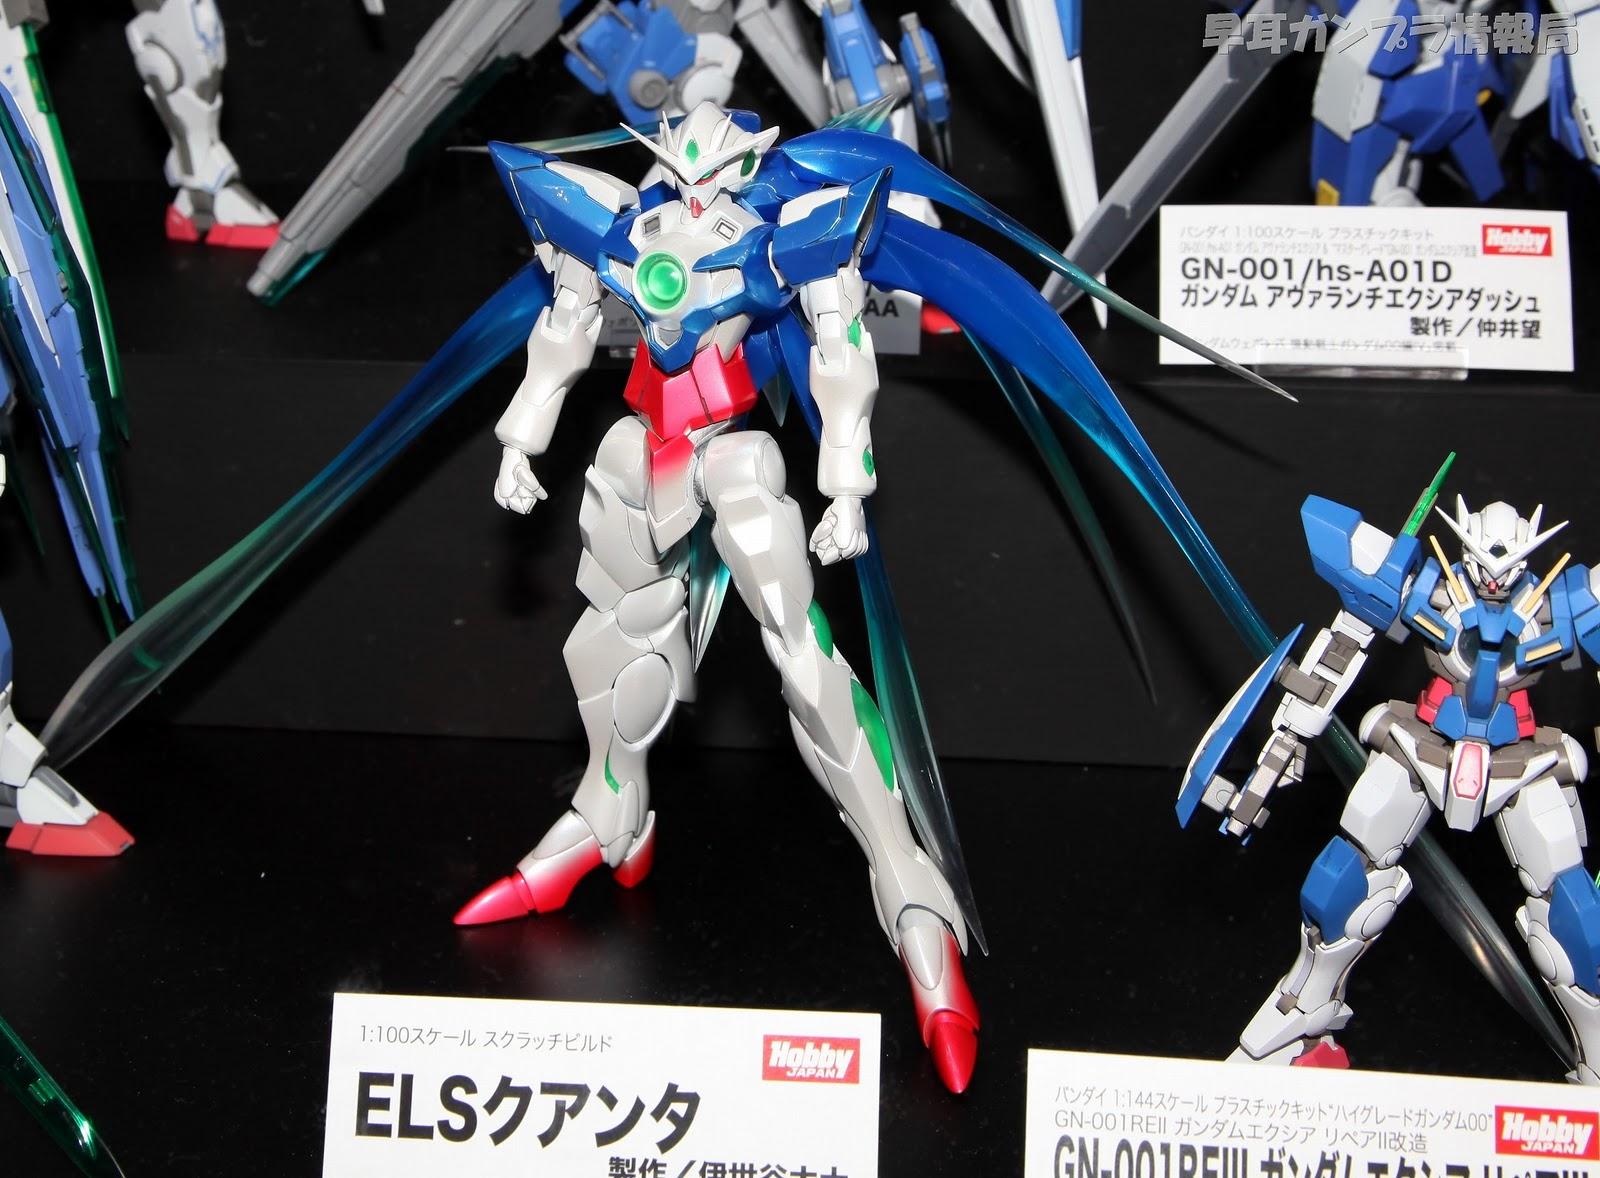 http://1.bp.blogspot.com/-LQUmt8BWiMs/TnYShD9vH1I/AAAAAAAAEMA/tFhzkuLznmU/s1600/Gundam%2000%2002.jpg